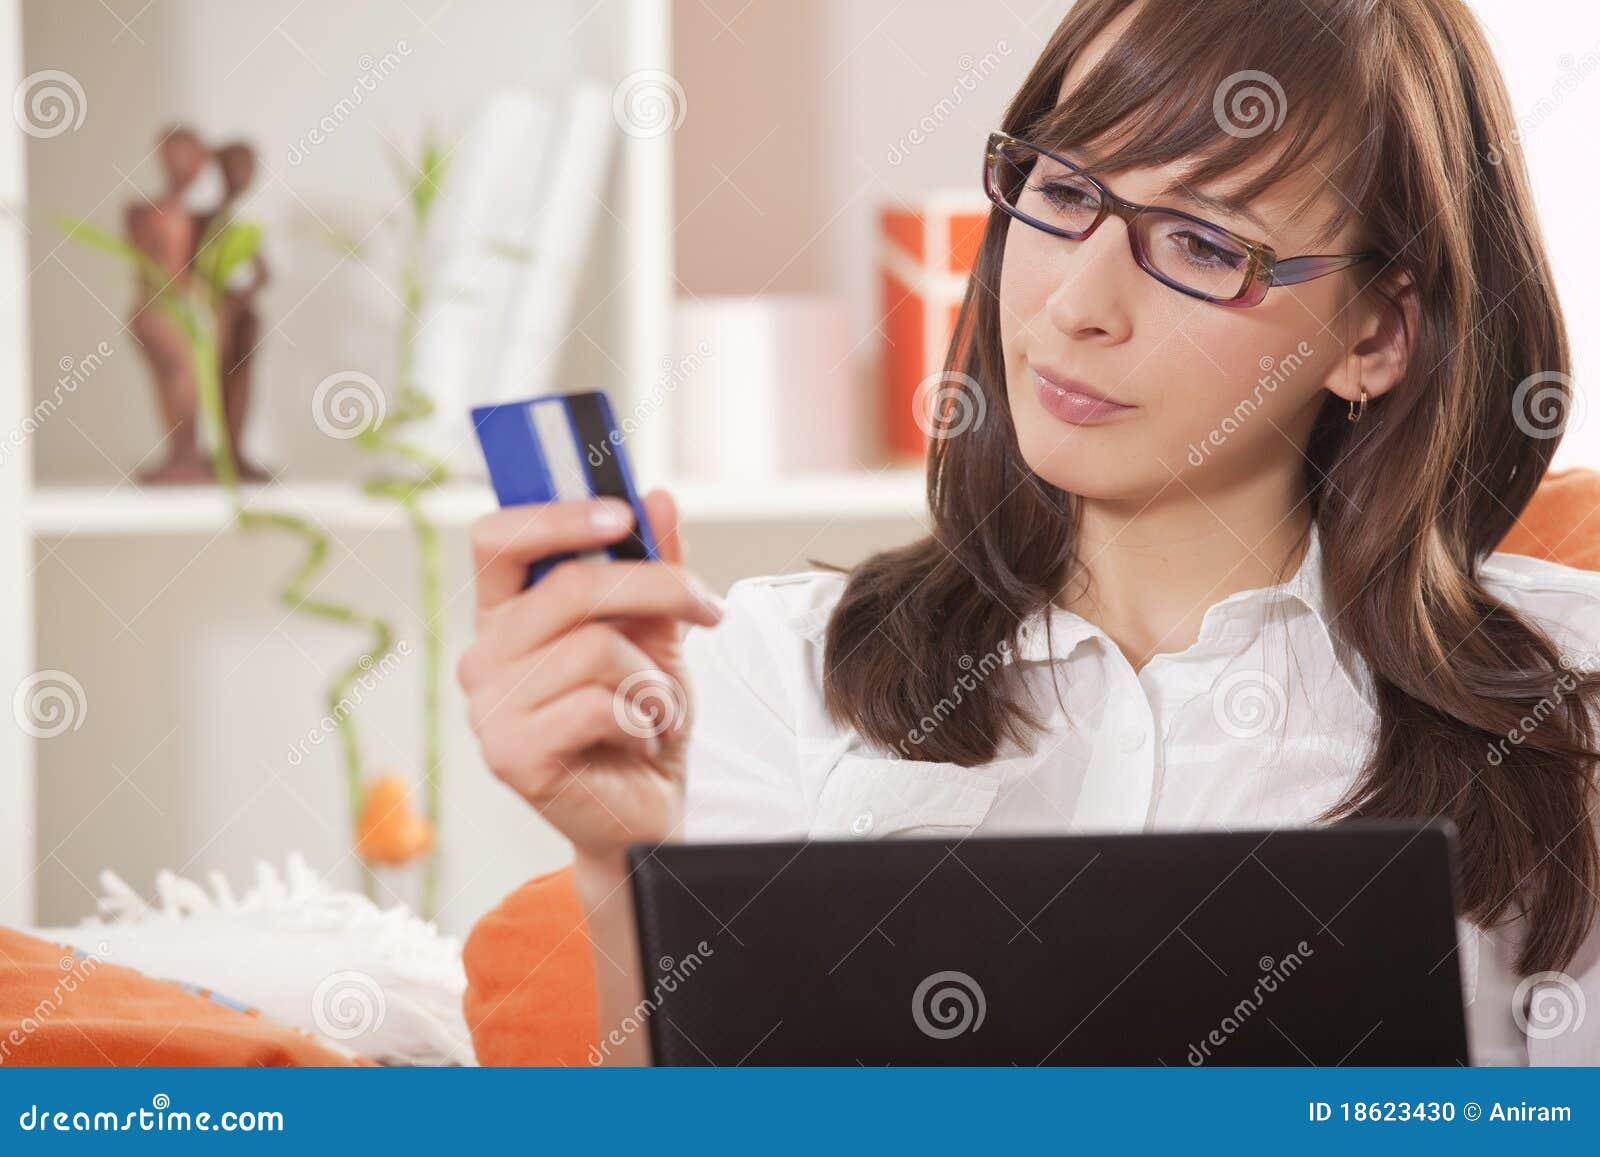 Стриптизерша обслуживает клиента 19 фотография